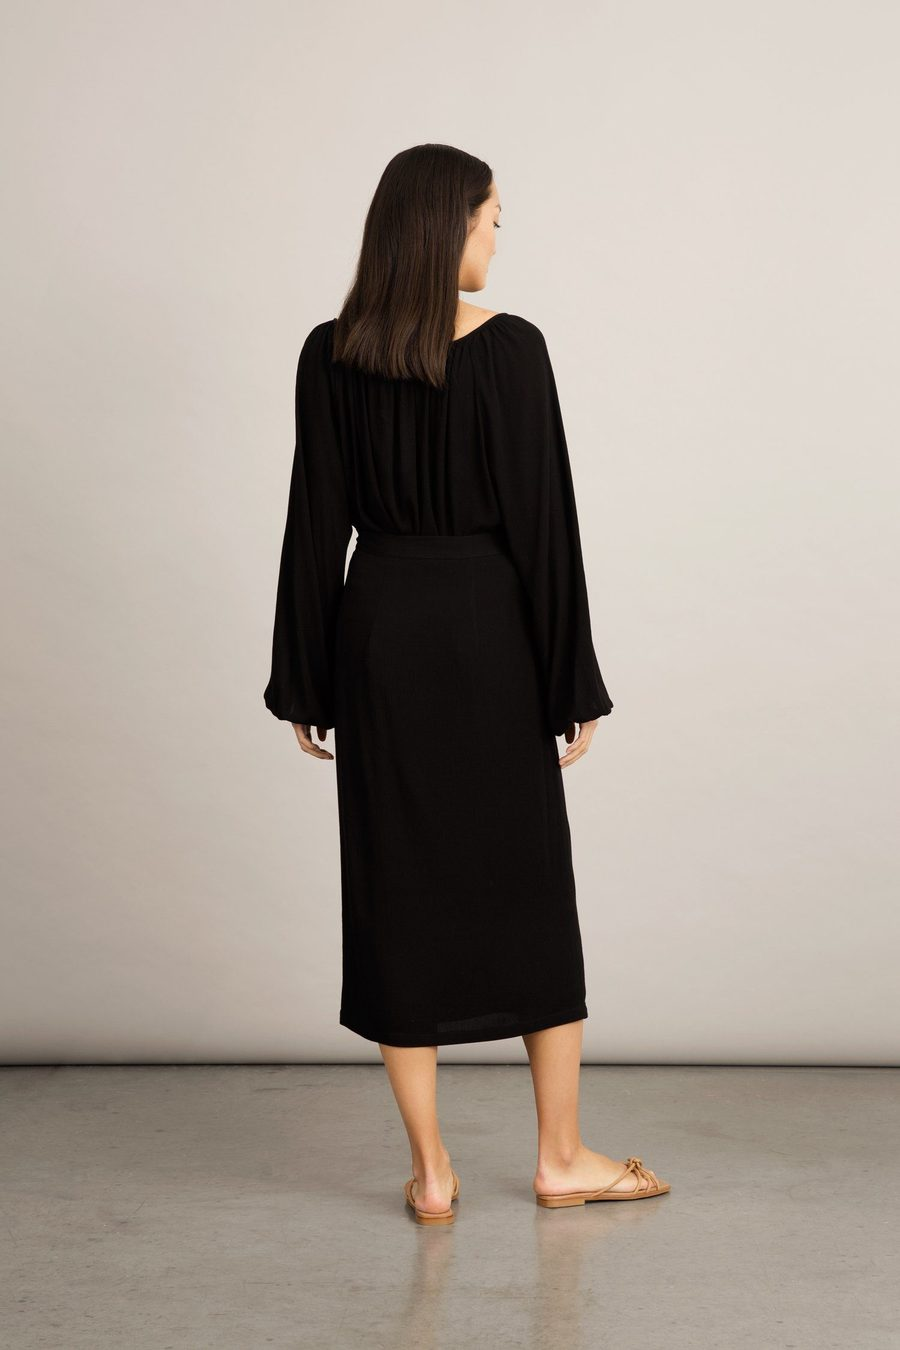 stadera-top-black-top-stylein-155234_900x.jpg